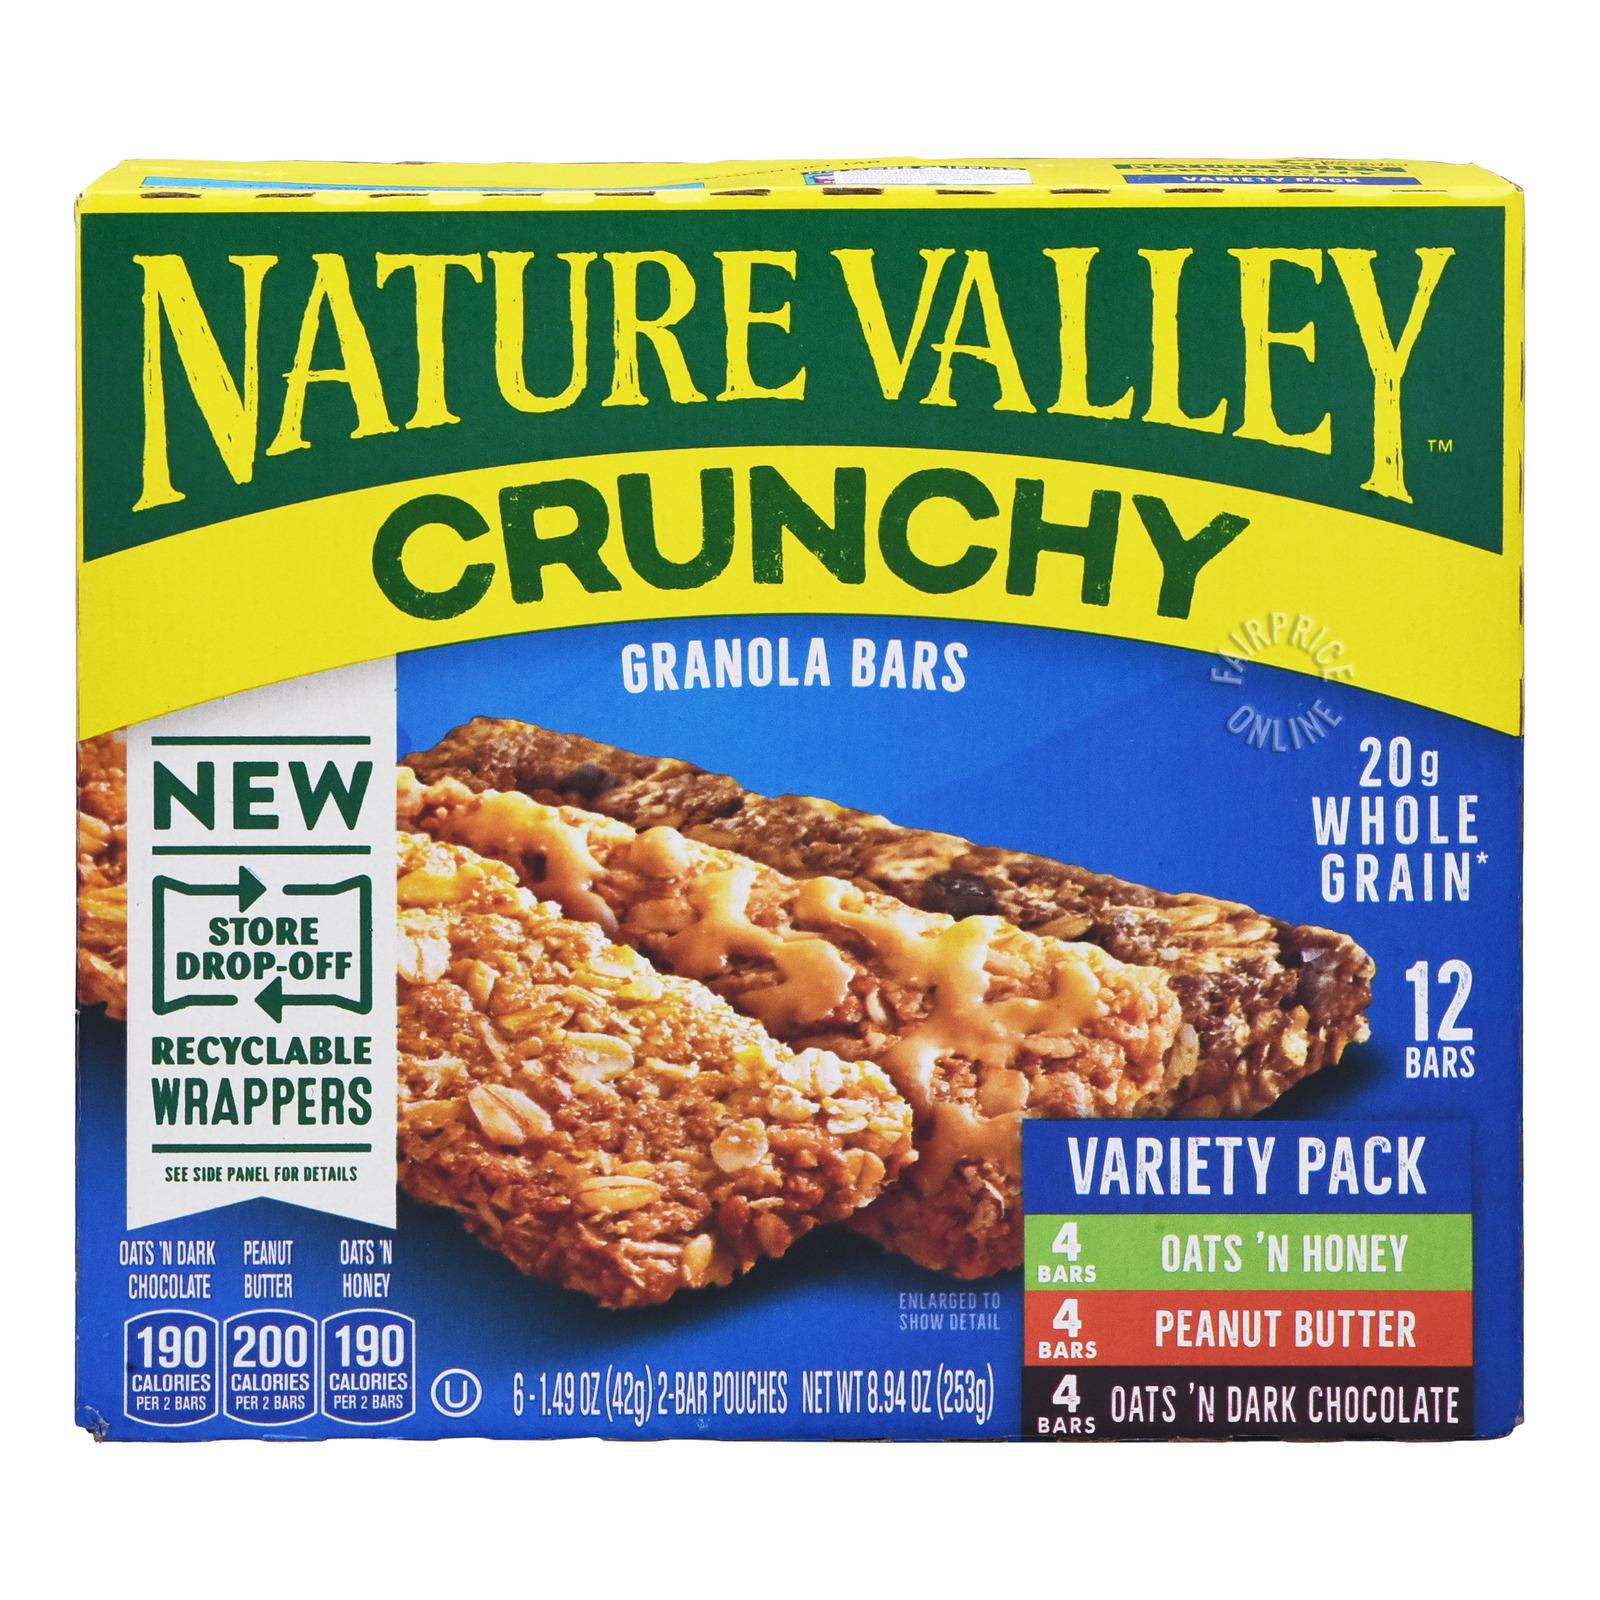 Nature Valley Crunchy Granola Bar - Variety Pack